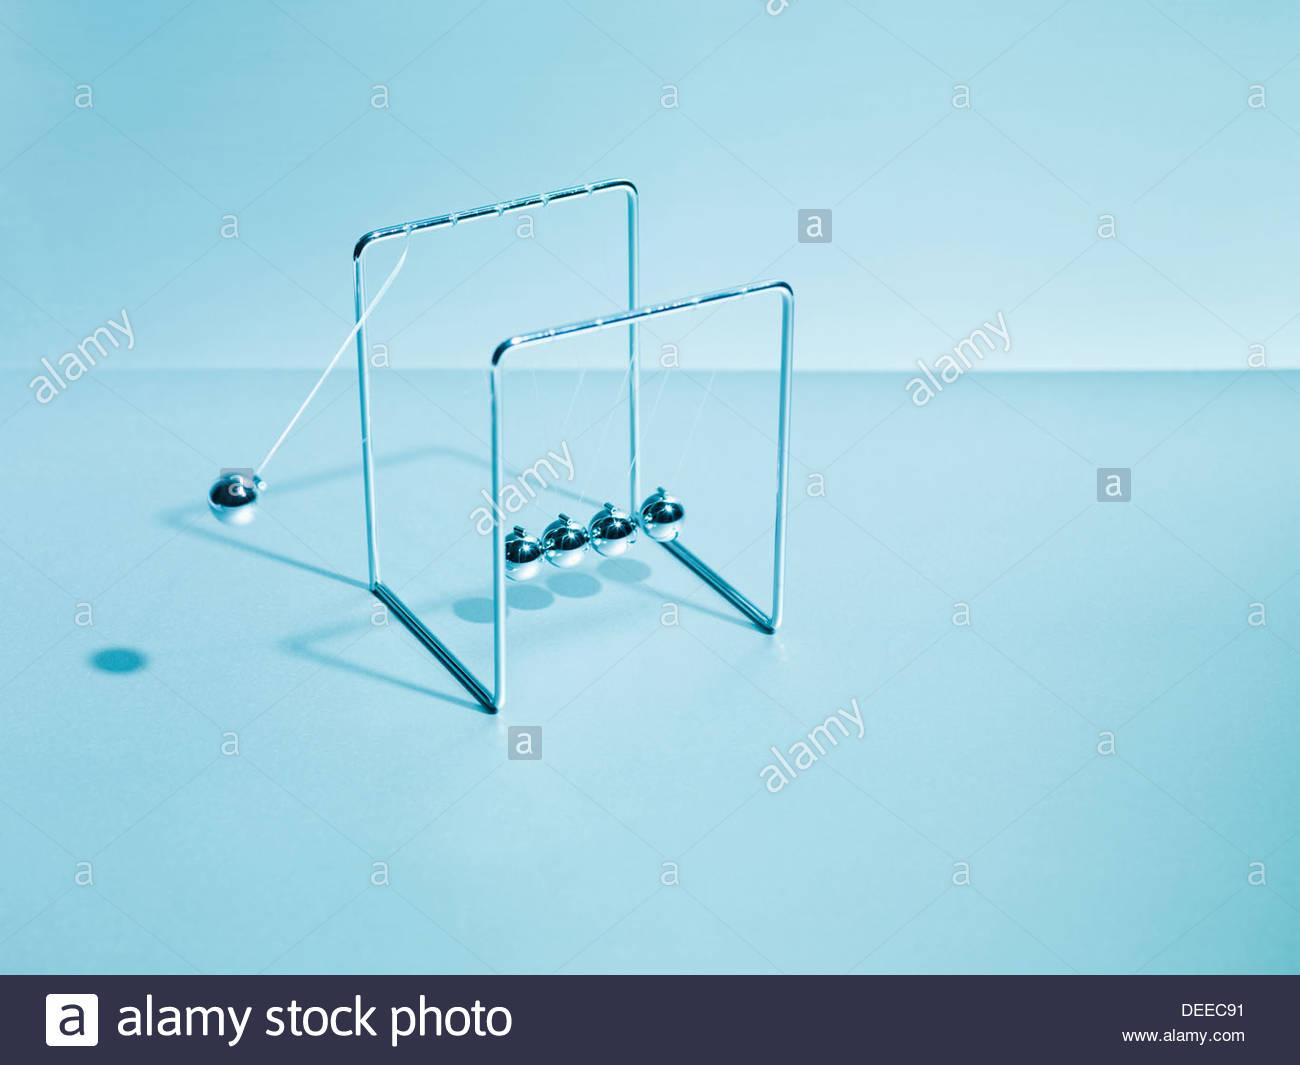 Berceau du Newton swinging Photo Stock